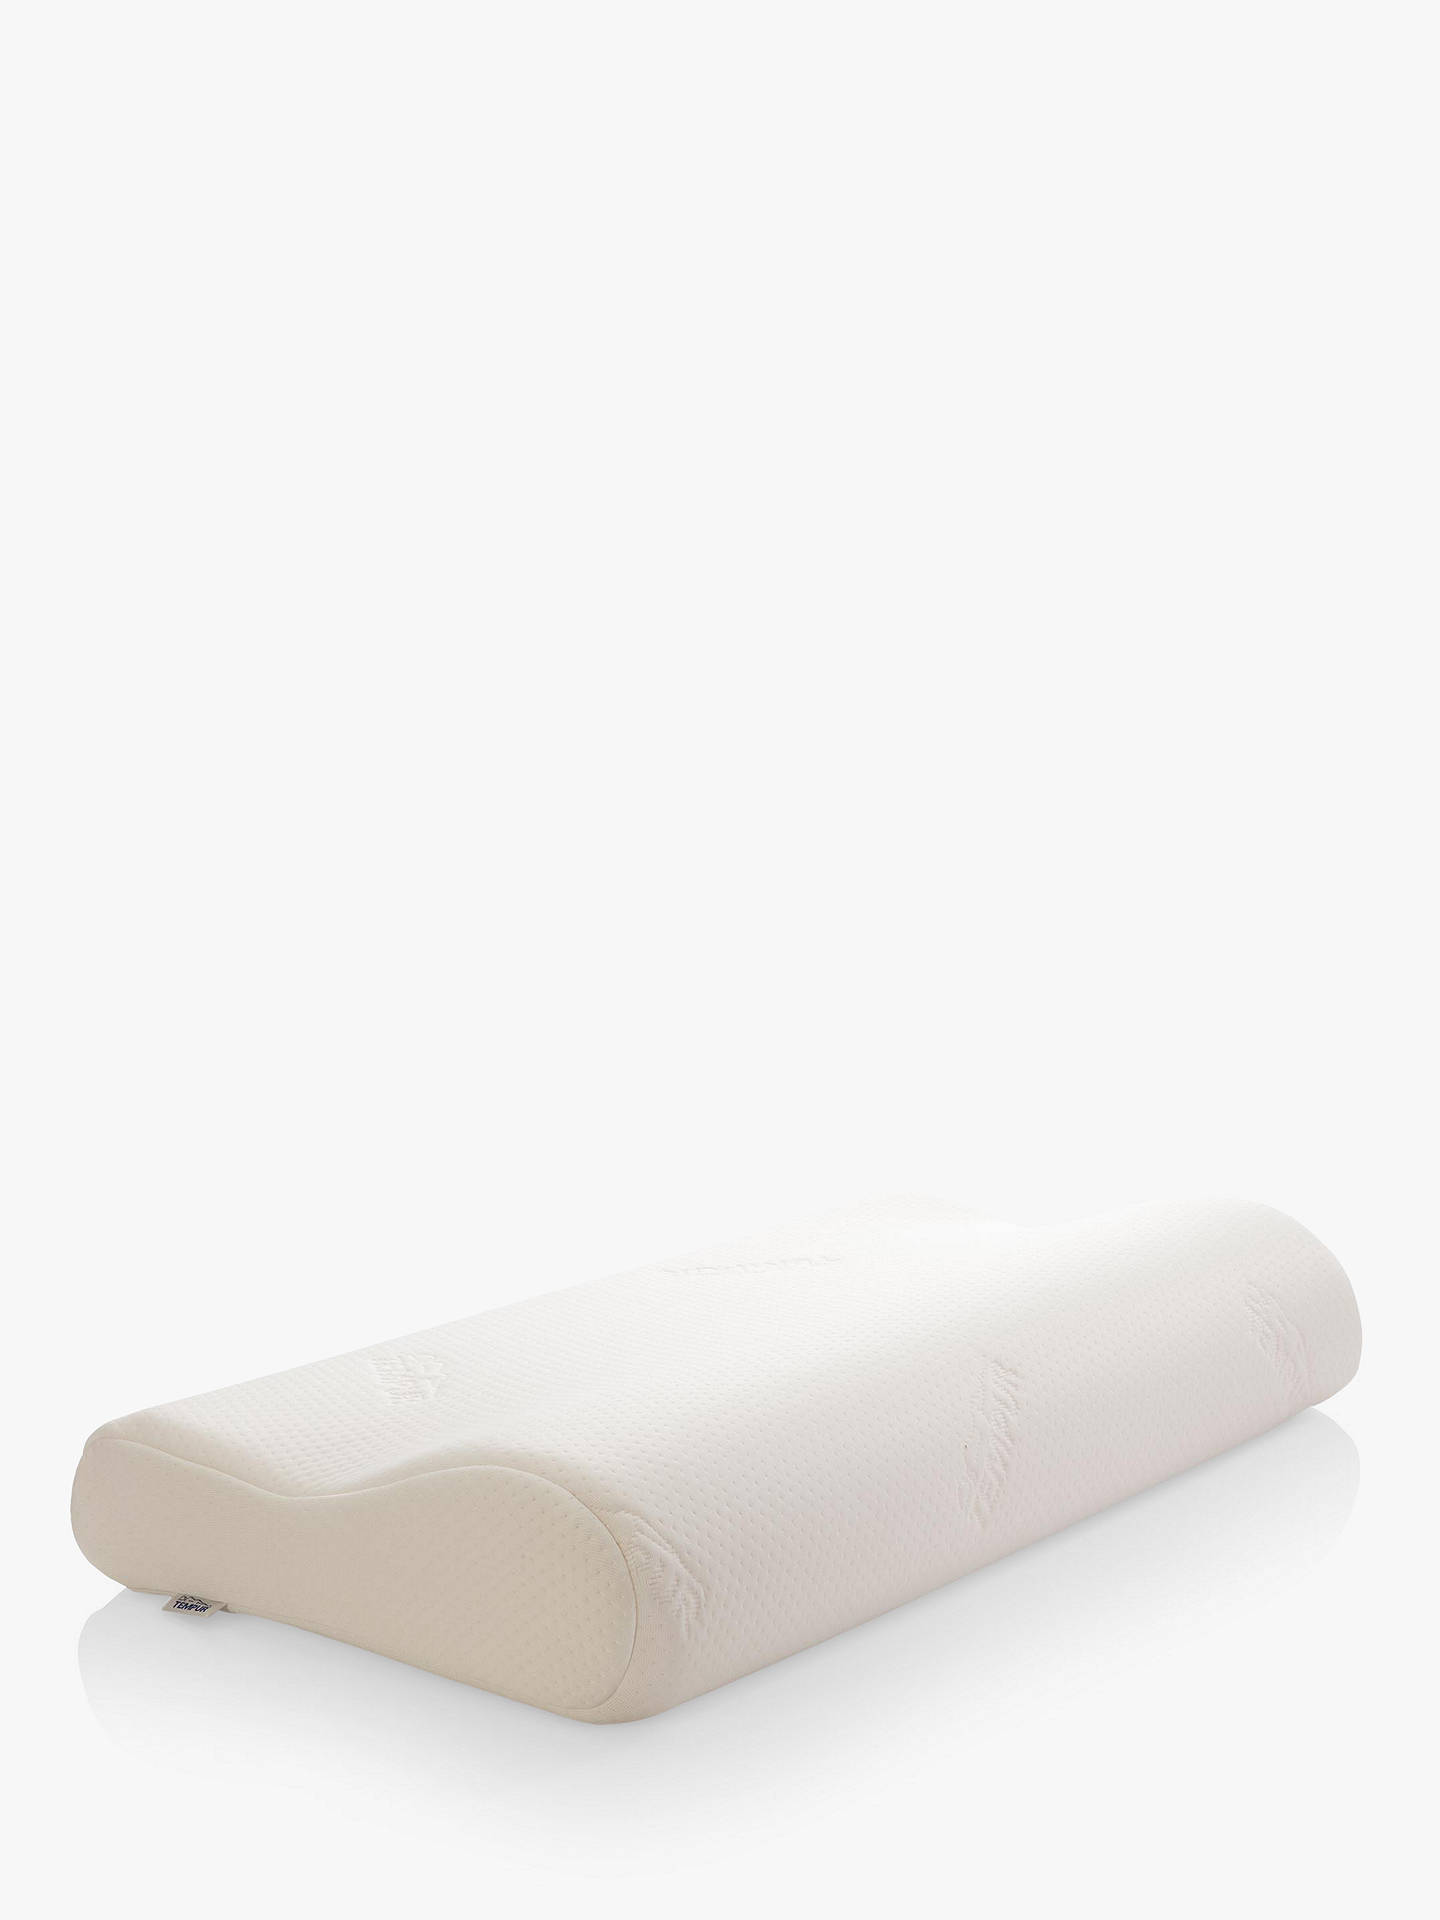 Tempur Original Queen Pillow Medium